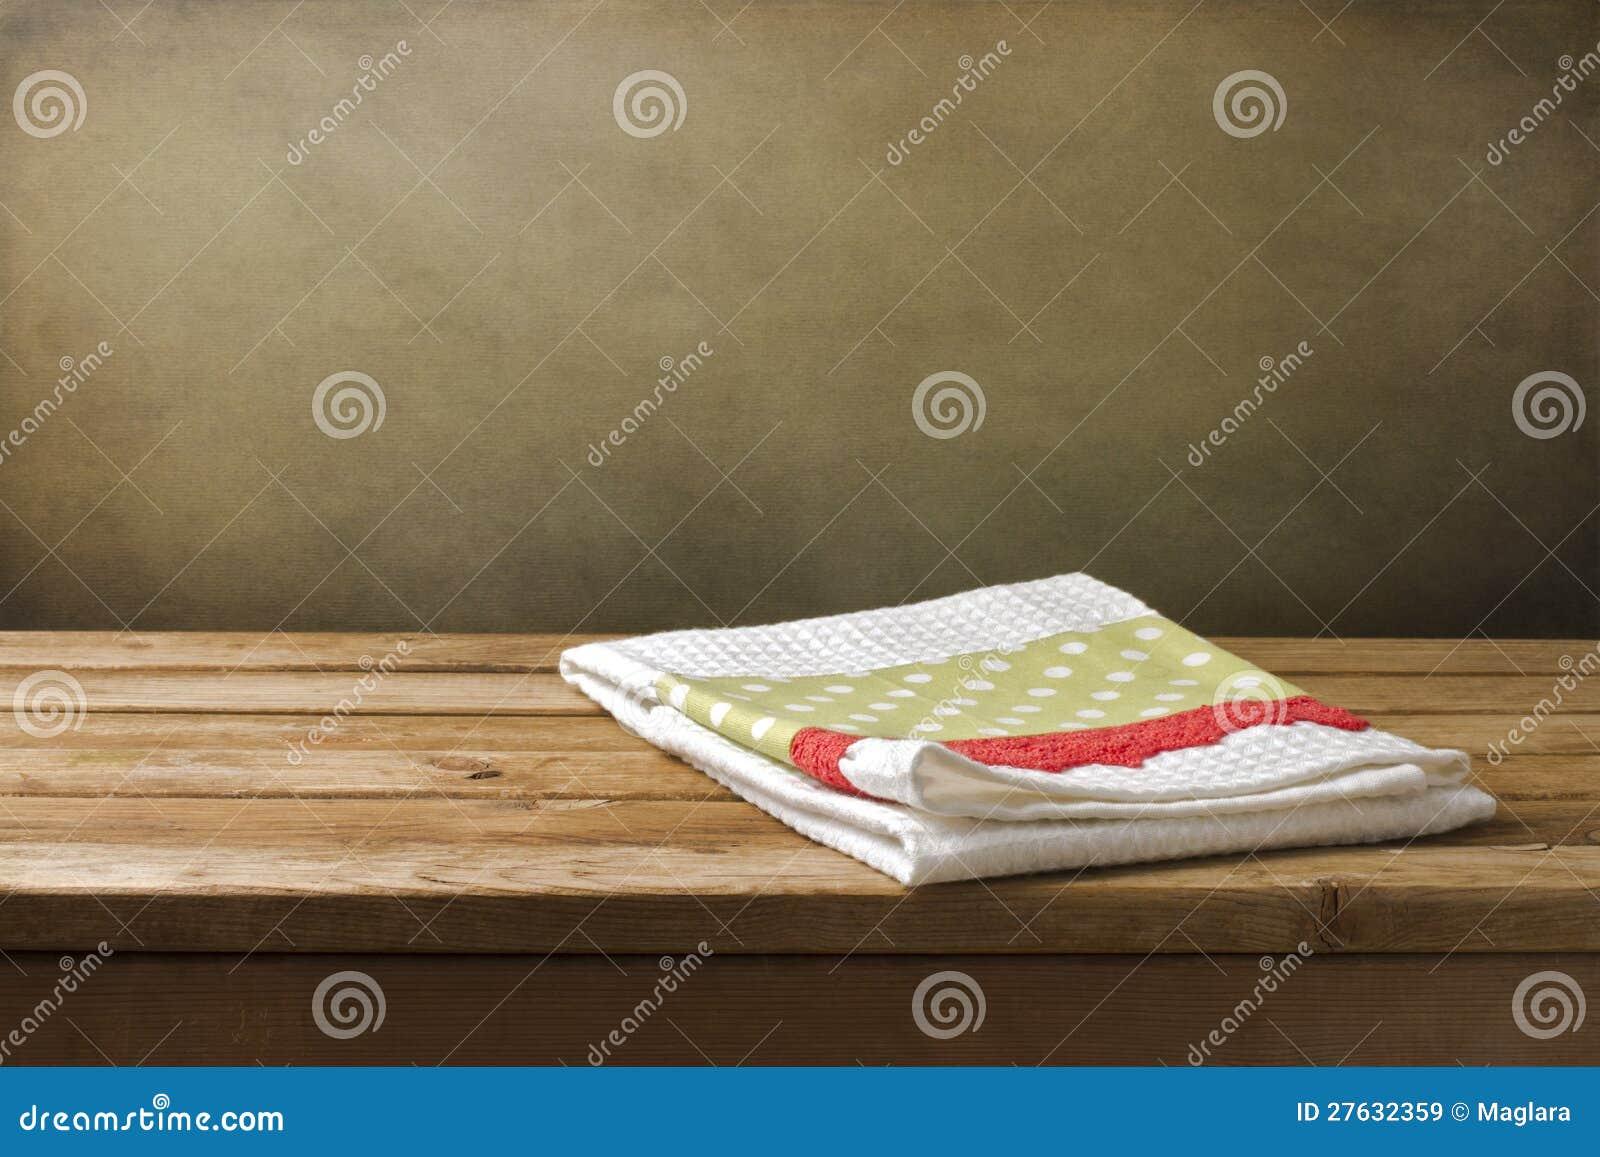 Полотенце кухни на деревянной таблице